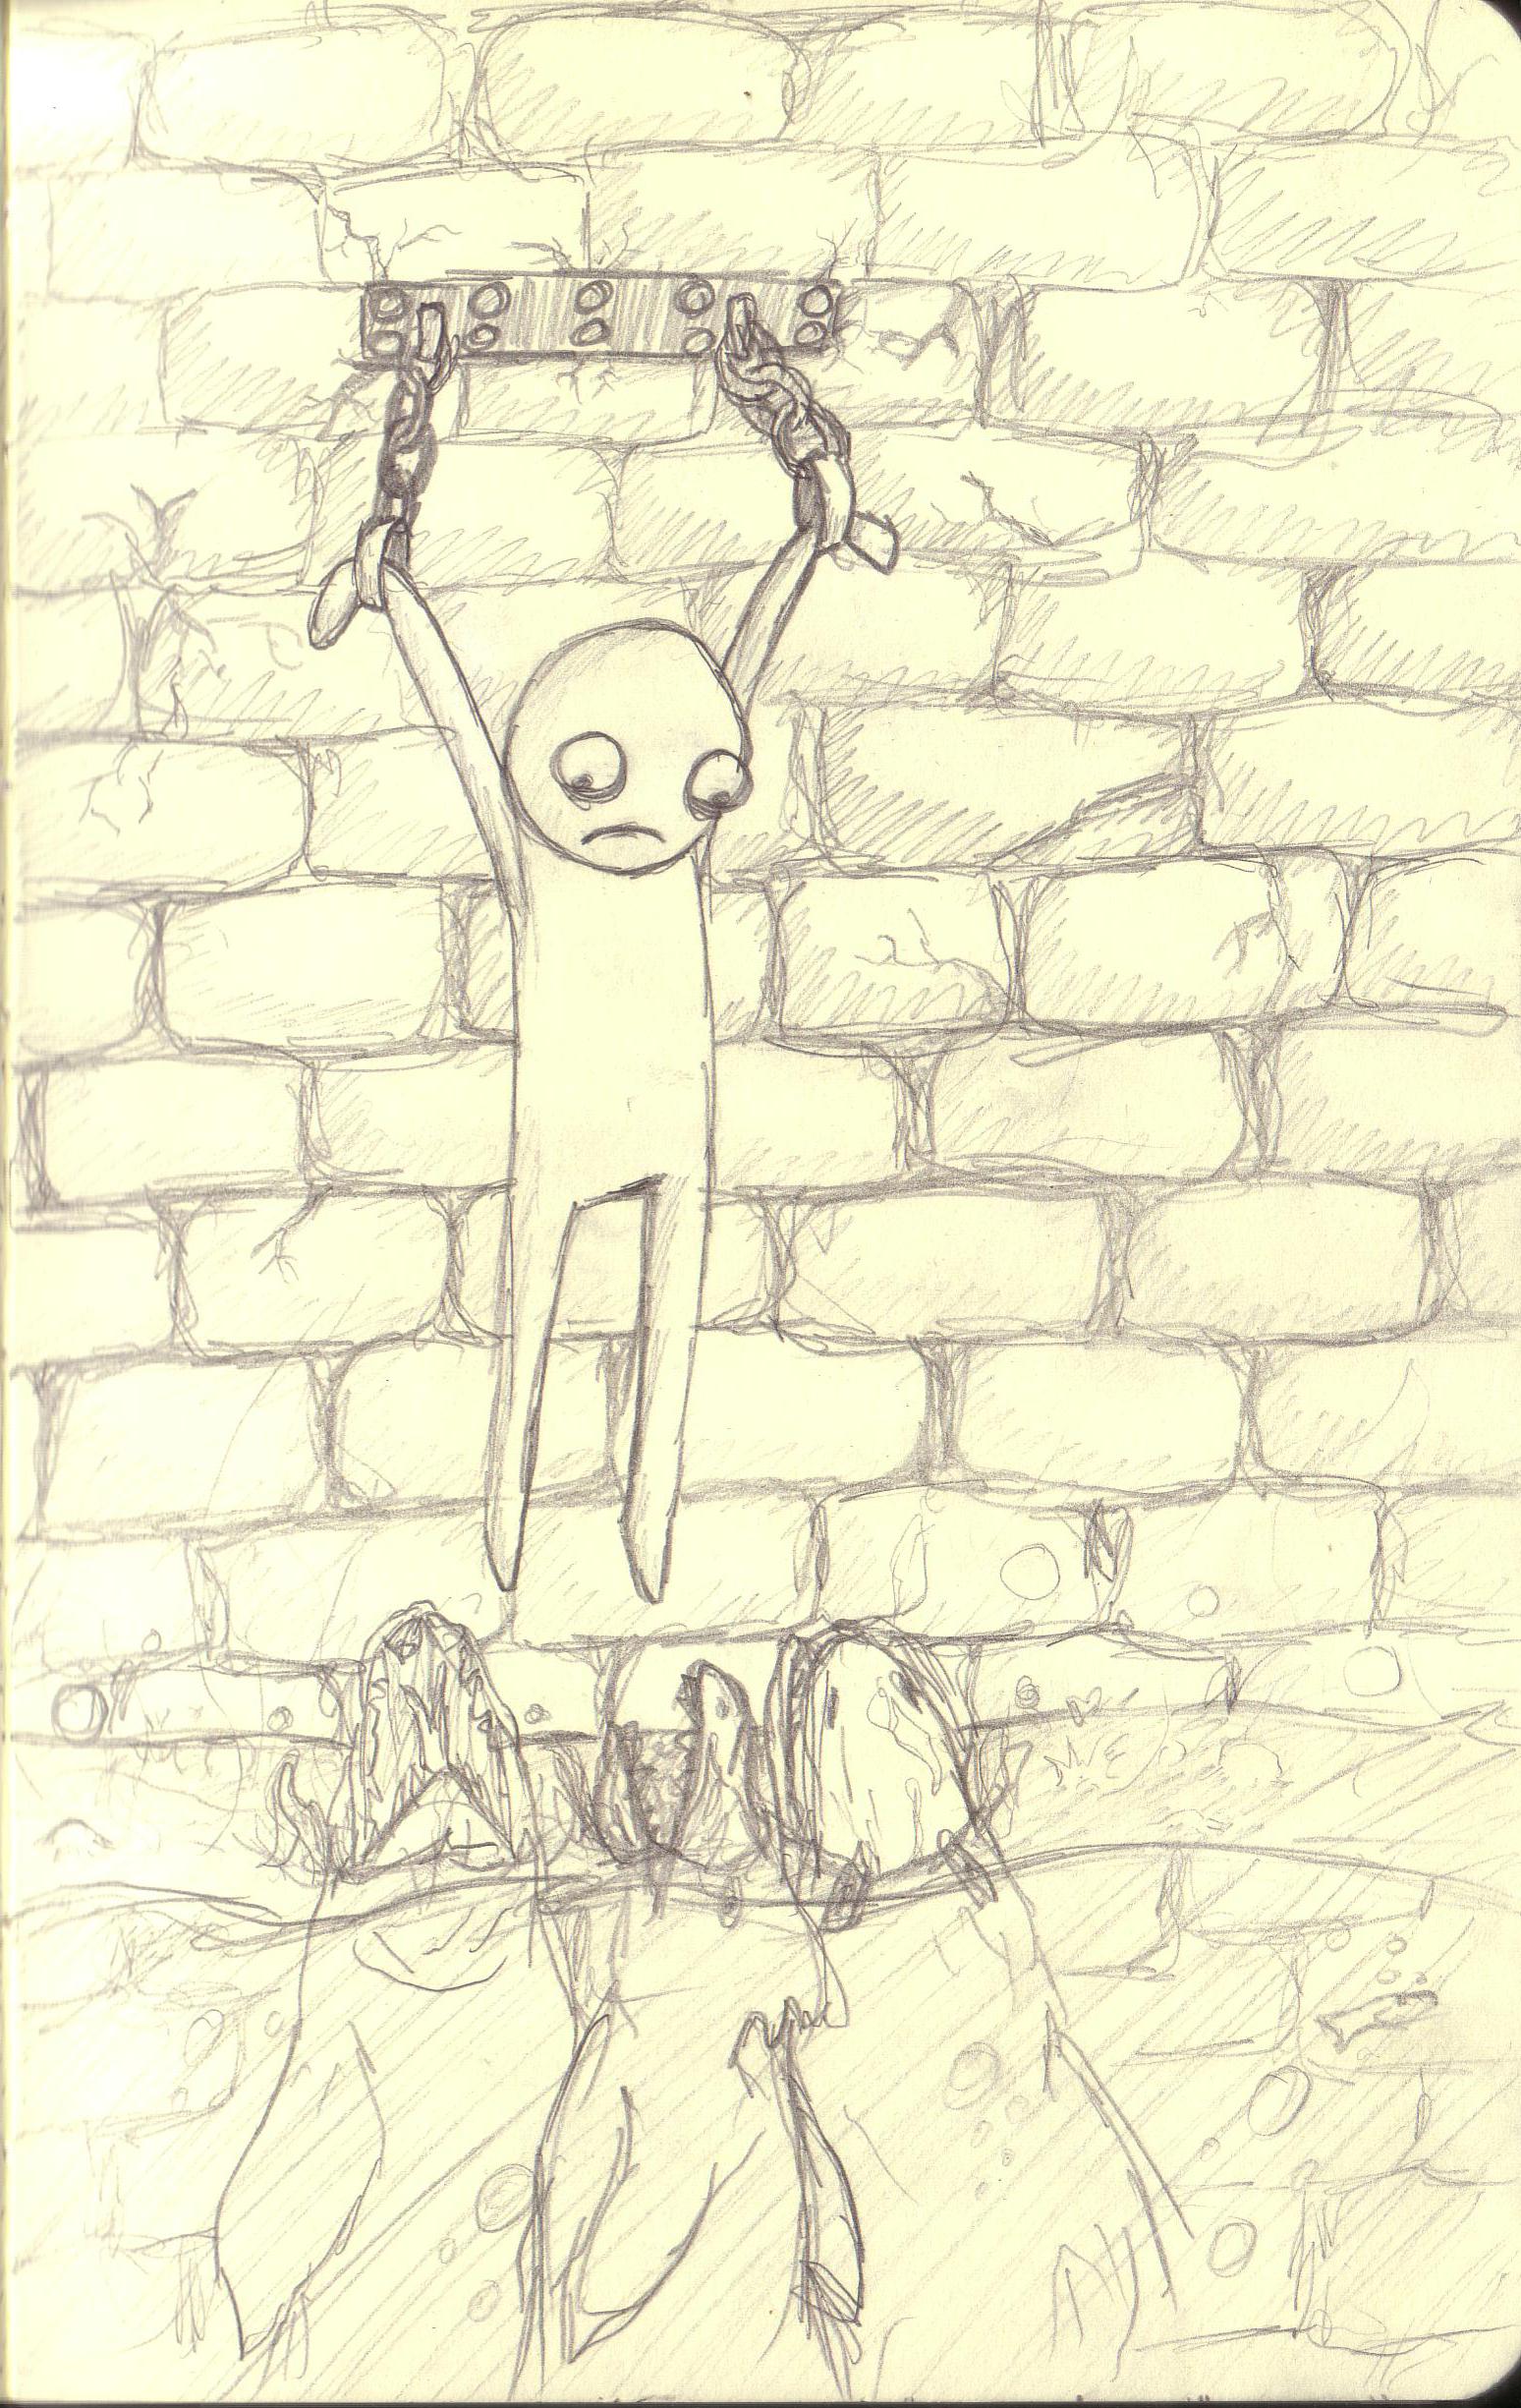 Guy on wall